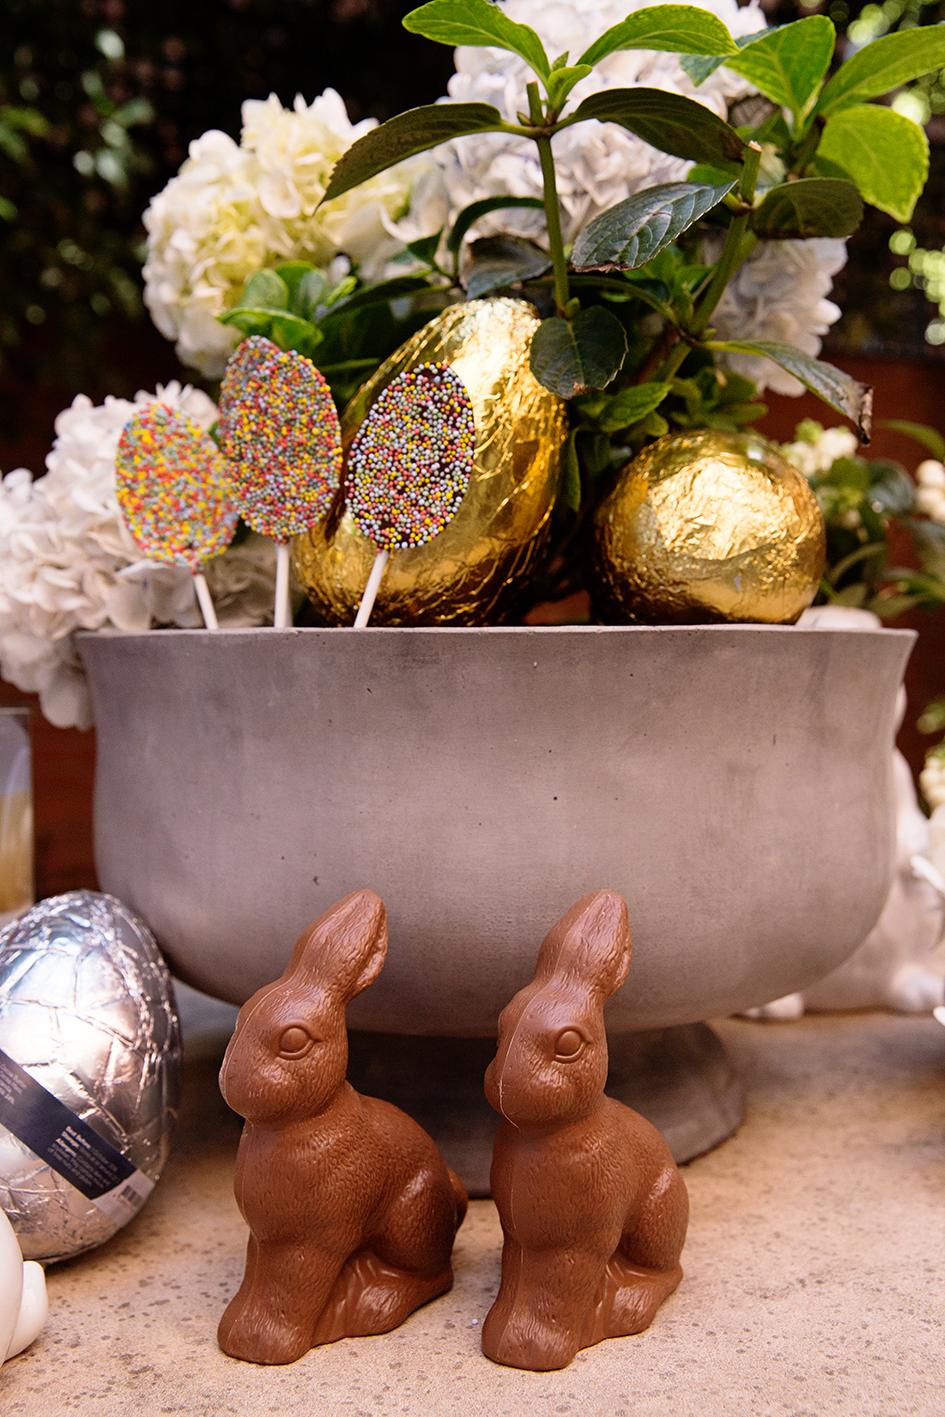 Chocolate Table 014.jpg